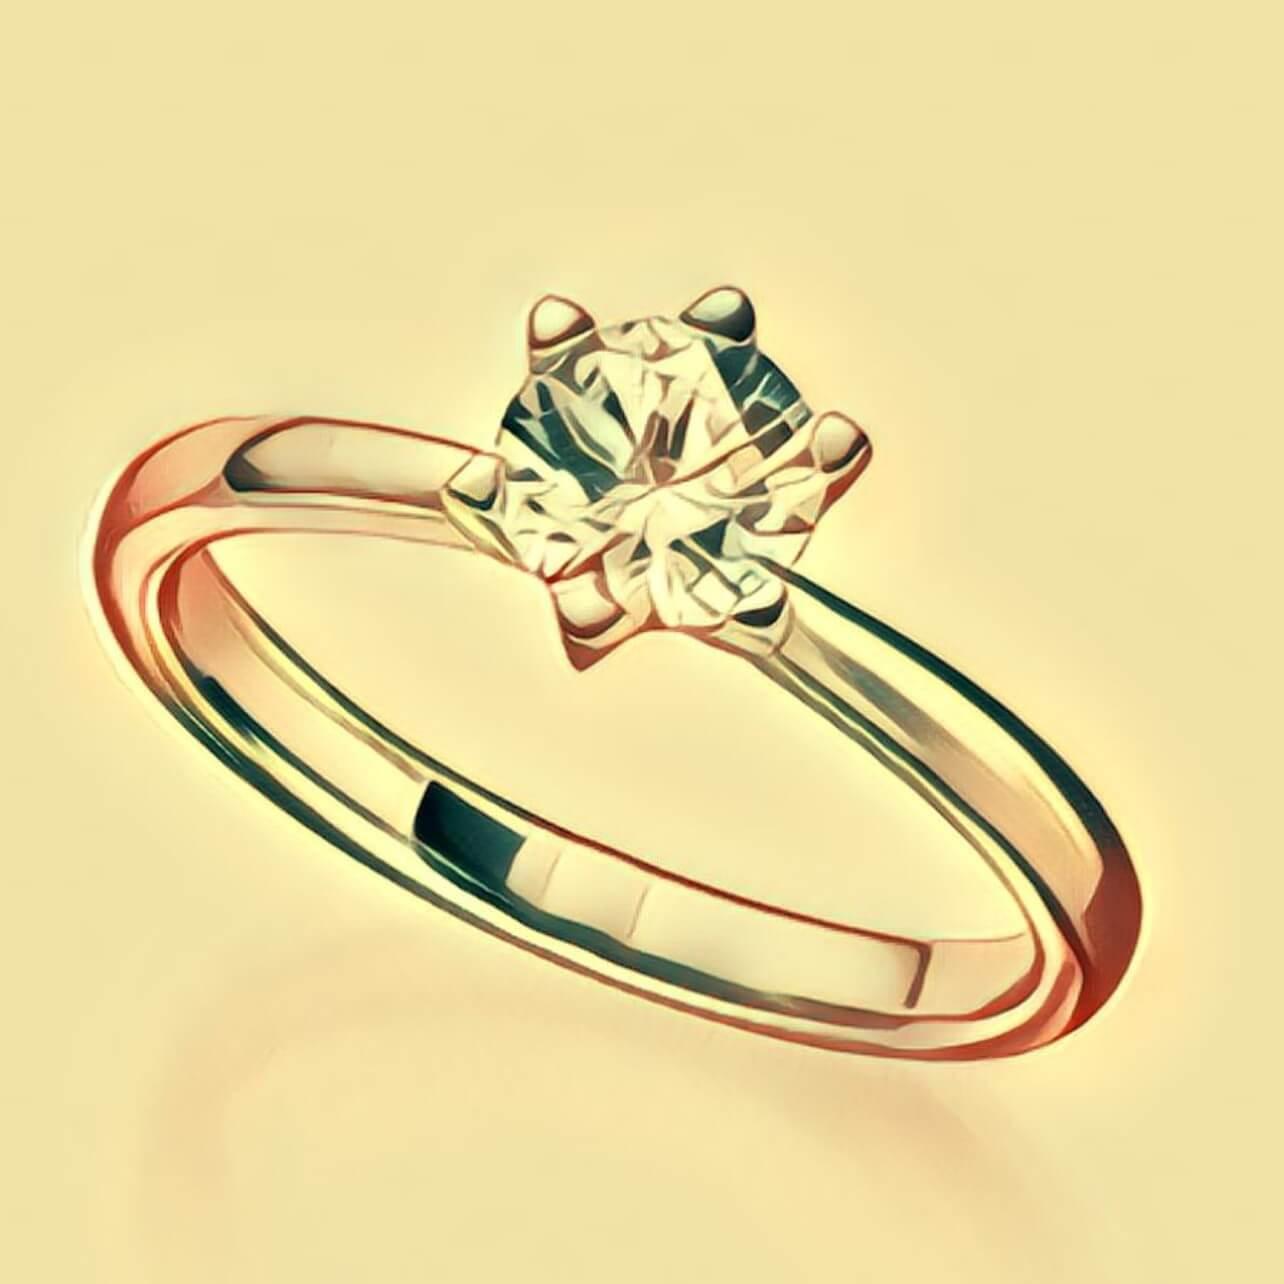 Ring - Traum-Deutung